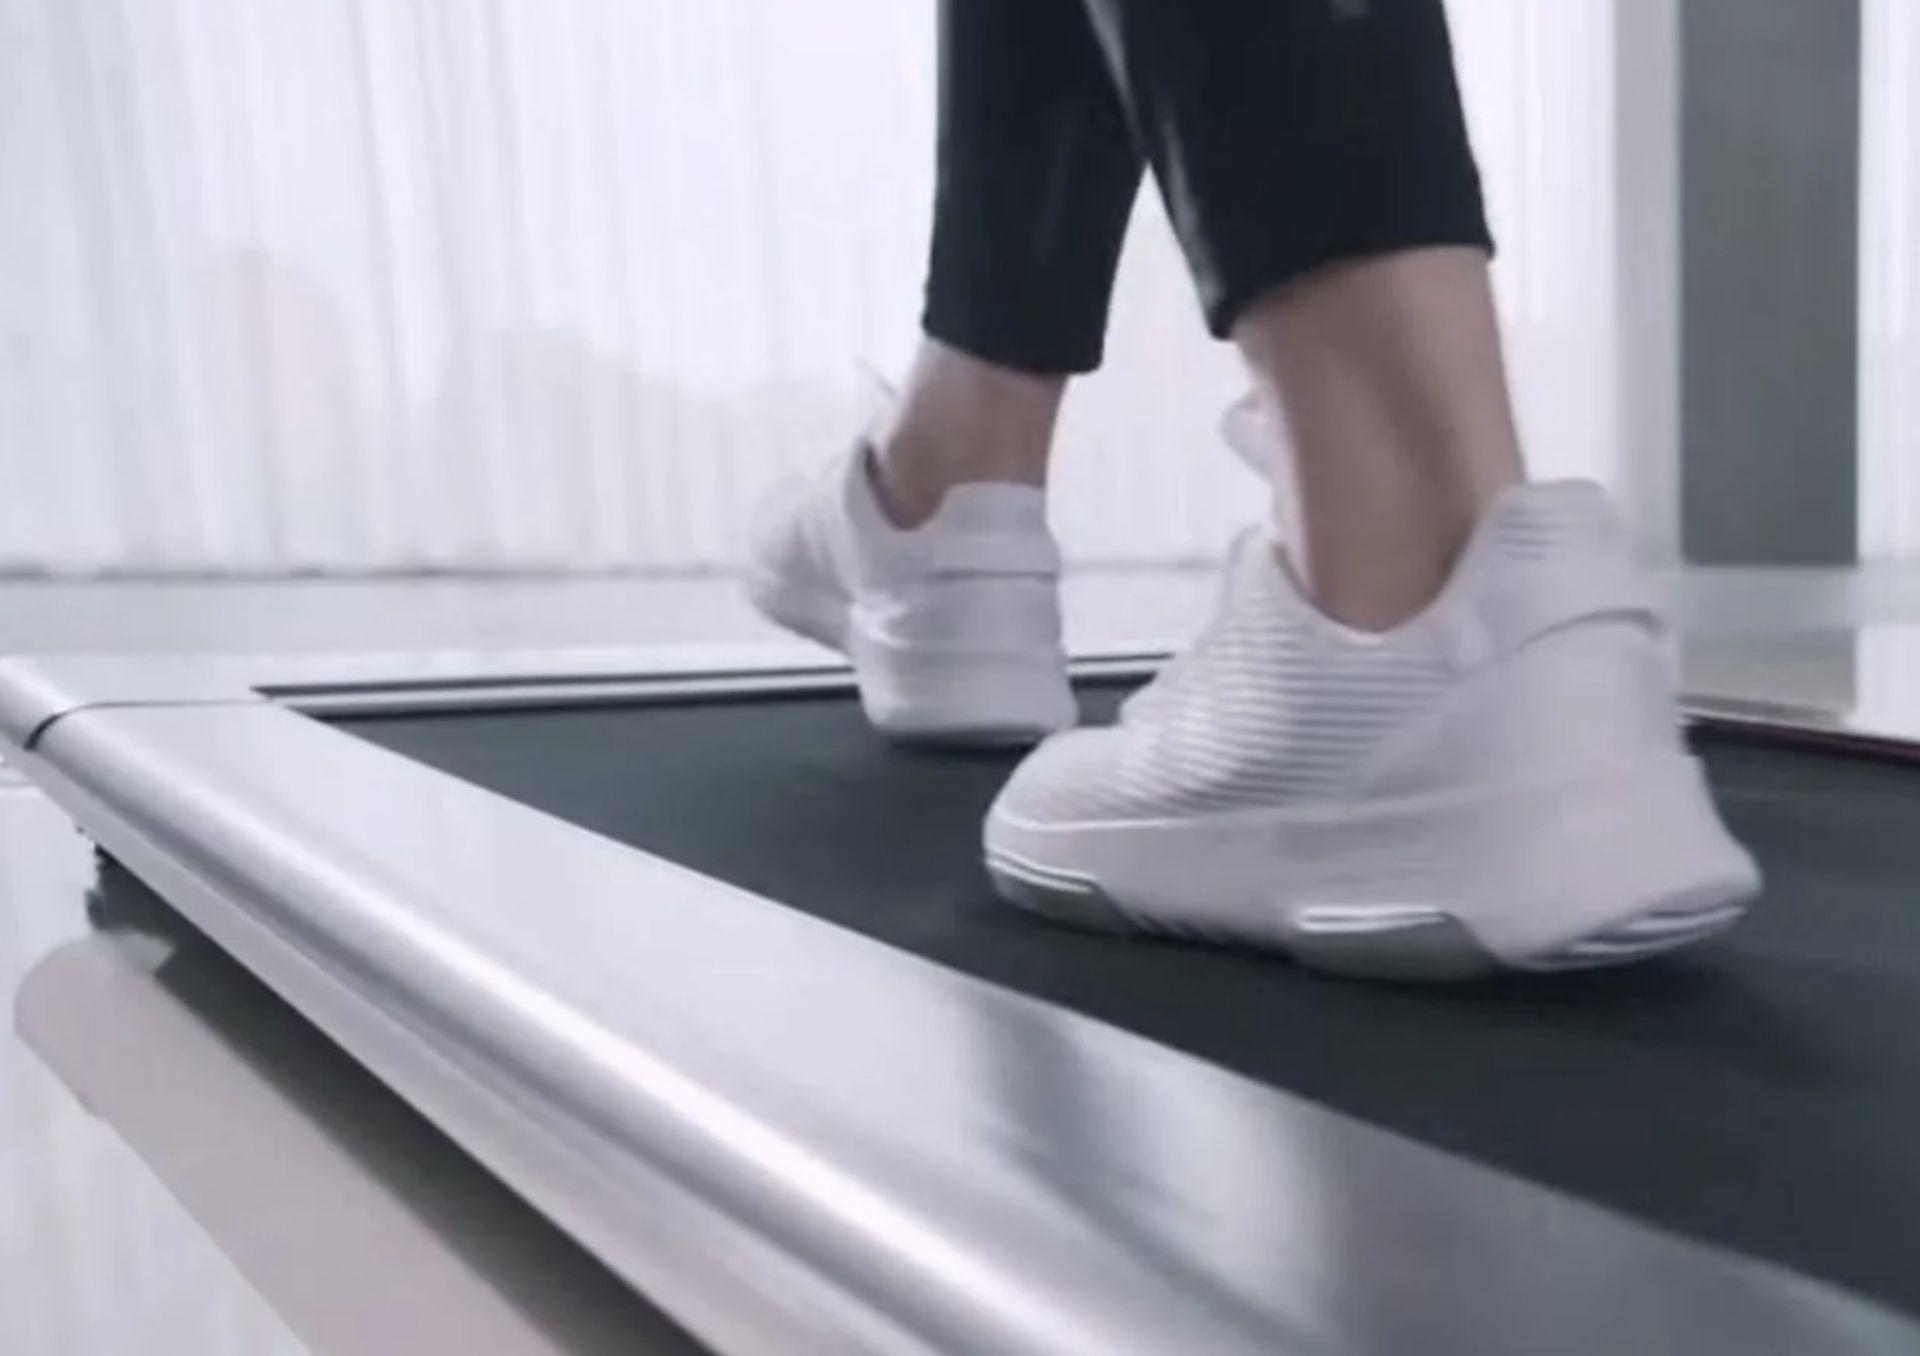 1 x Slim Tread Ultra Thin Smart Treadmill Running / Walking Machine - Lightweight With Folding - Image 7 of 23